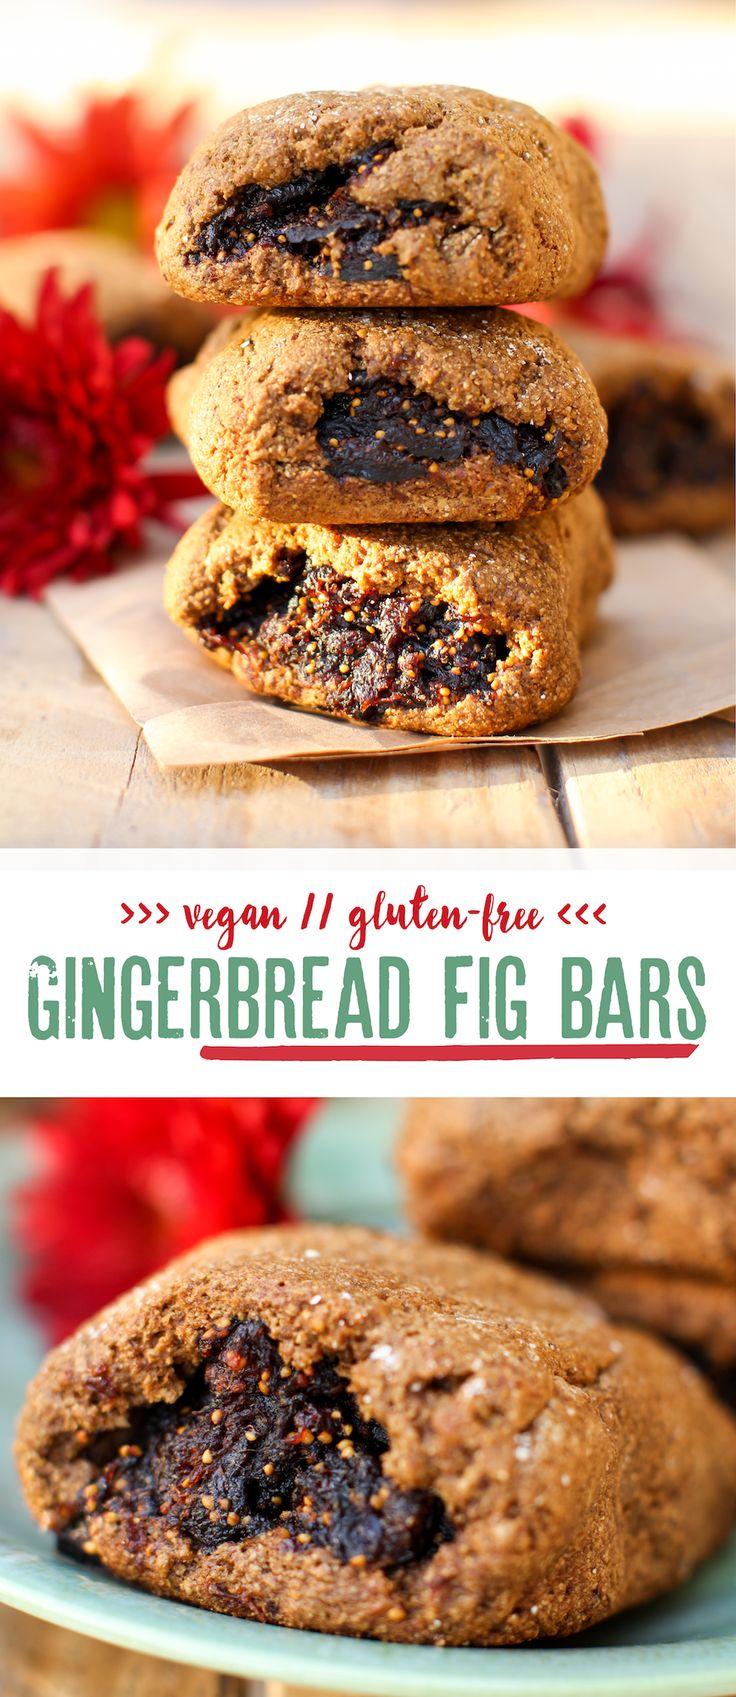 VEGAN (gluten free) Gingerbread Fig Bars